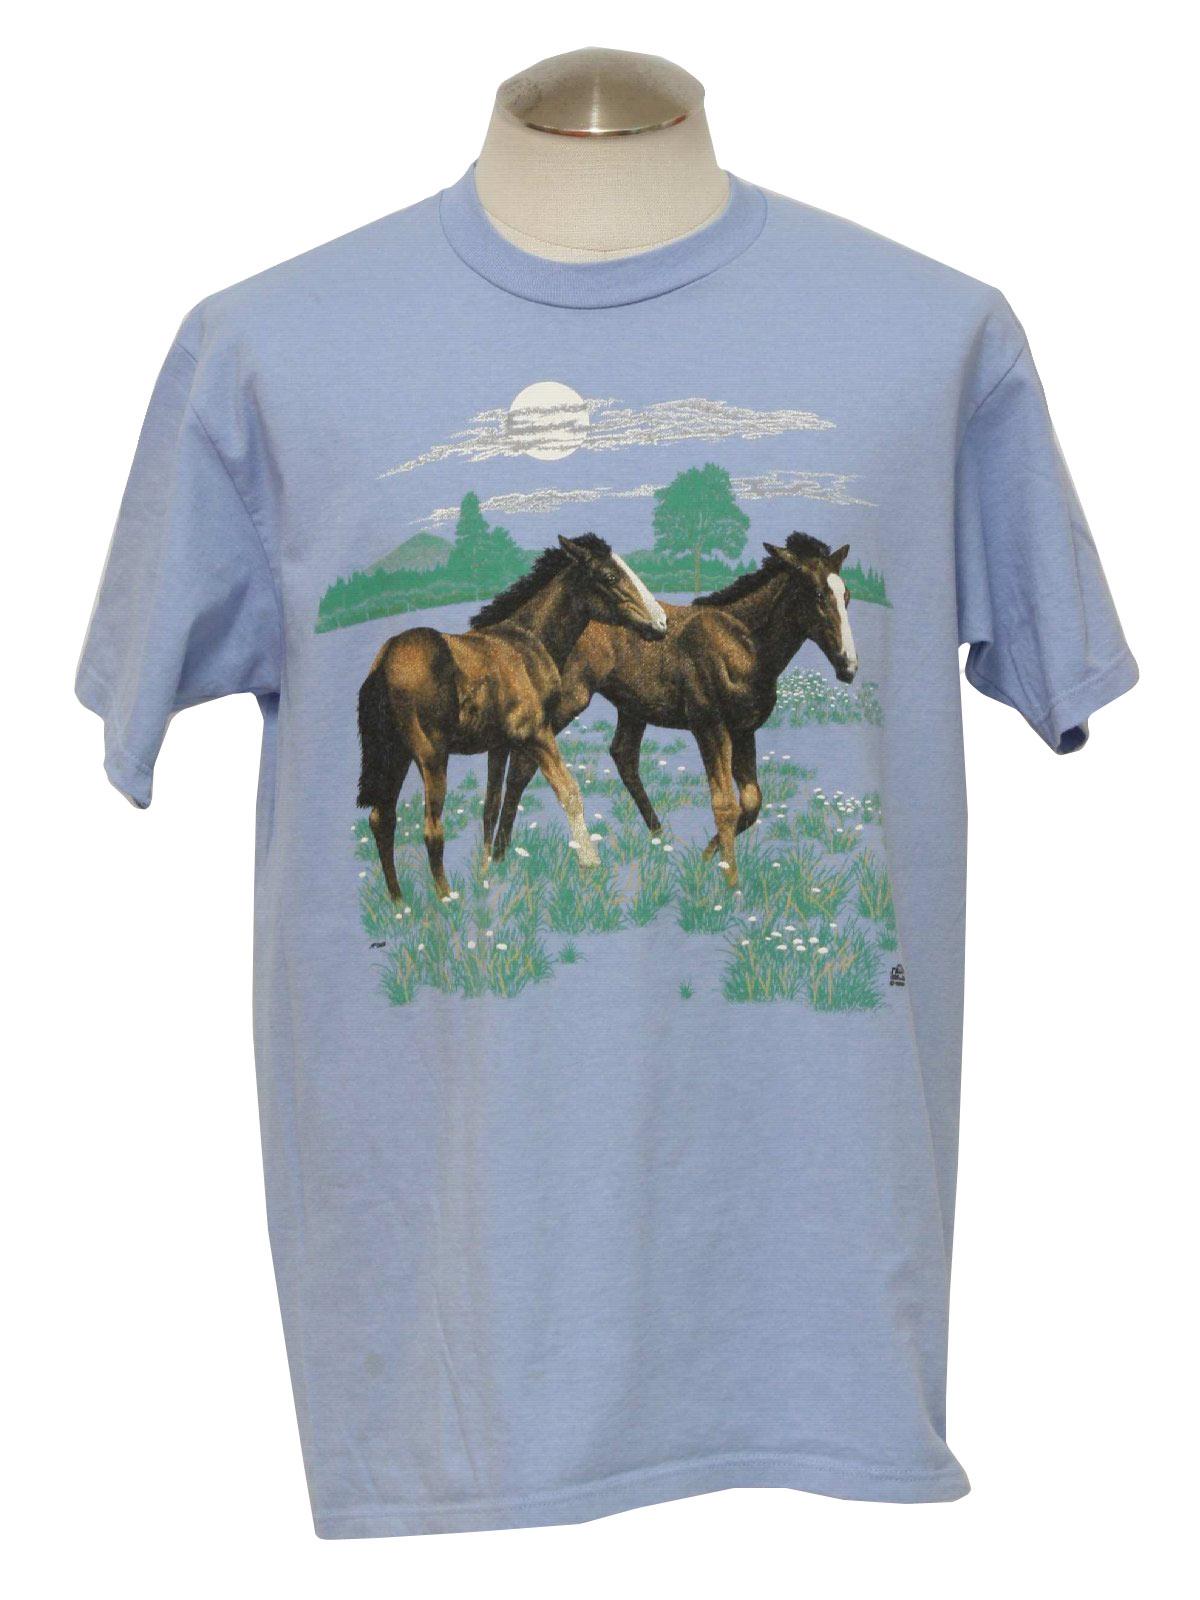 Vintage Jerzees 90 s T Shirt  90s -Jerzees- Unisex light blue 6800f7dc5